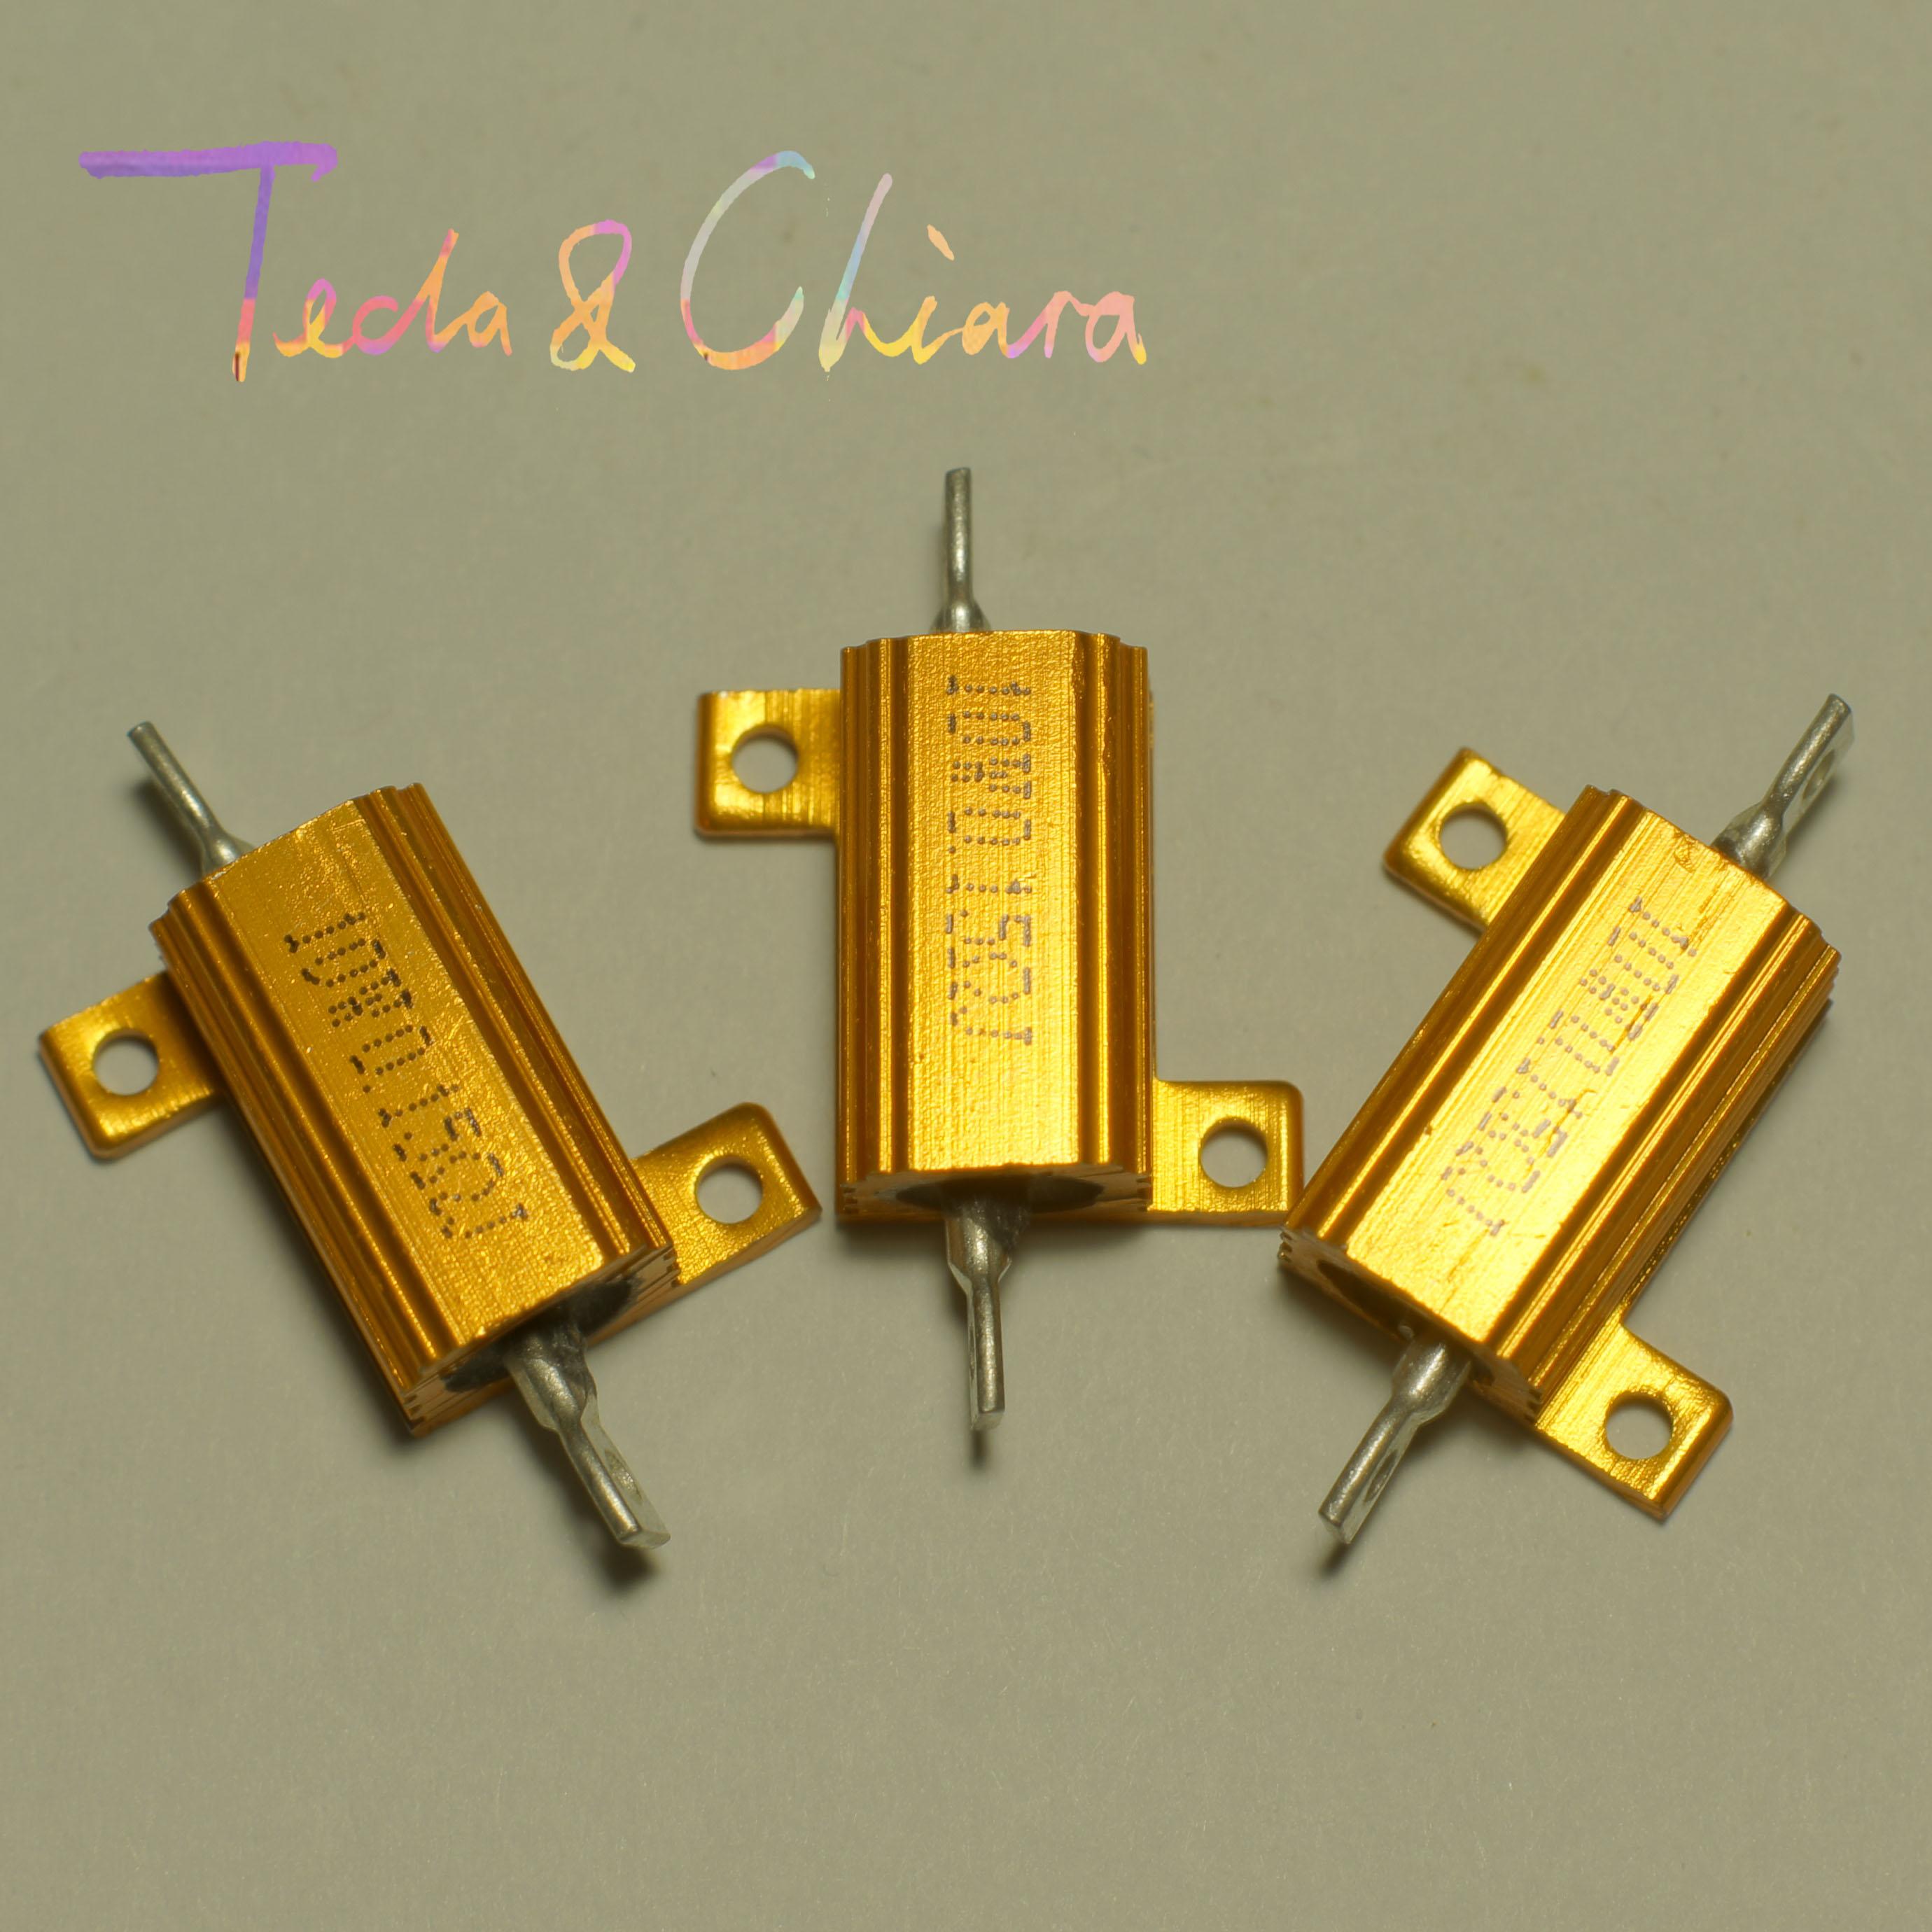 22R 22 22ohm 0.1R 0.1 0.1ohm R Ohm 10W Watt Gold Tone Wirewound Aluminum Power Metal Shell Case Resistance Resistor RX24 цена